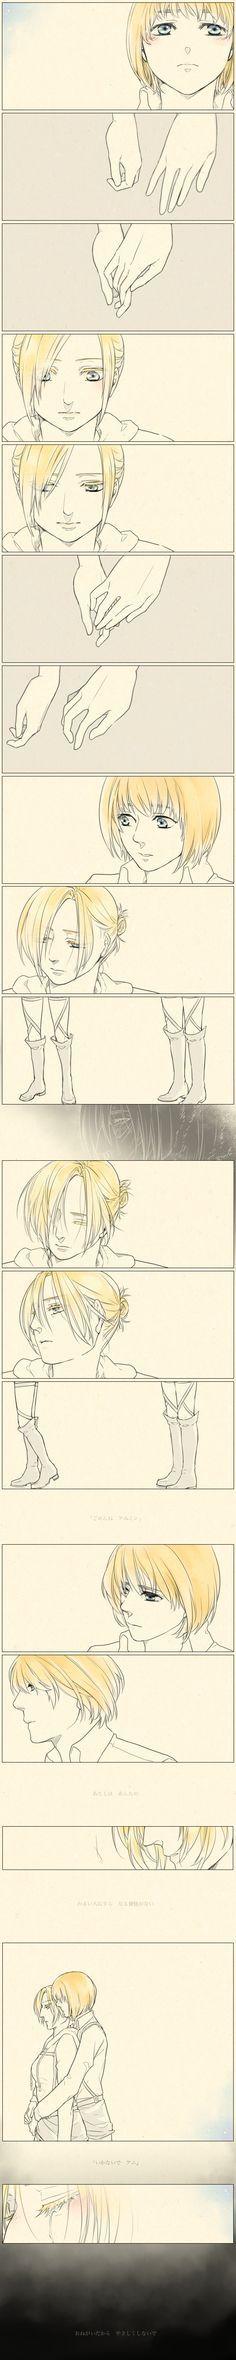 Annie and Armin / Attack on Titan